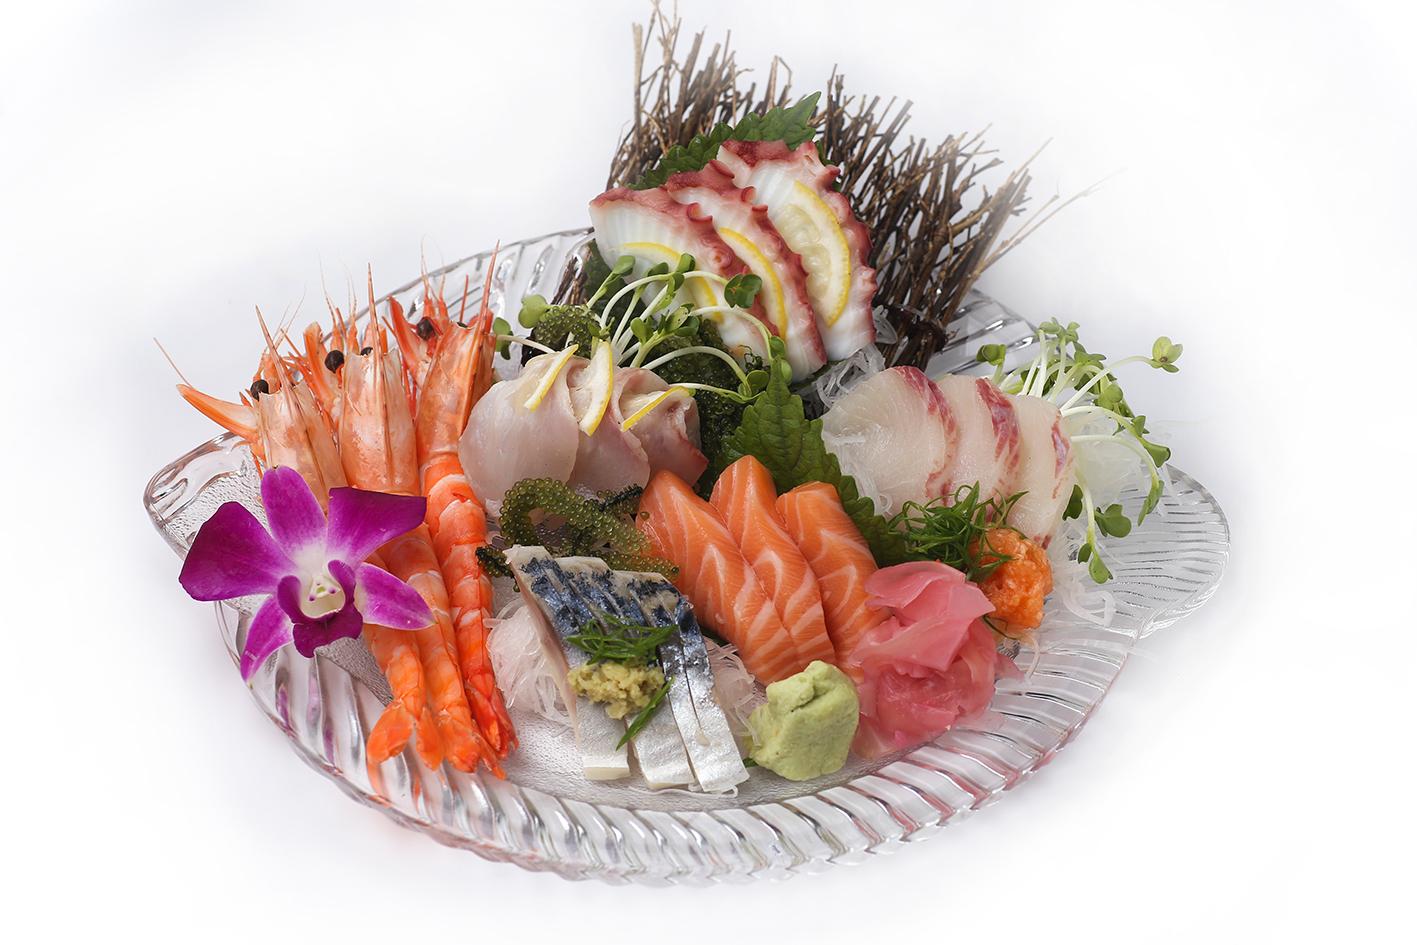 Sashimi Tổng Hợp (6 loại)